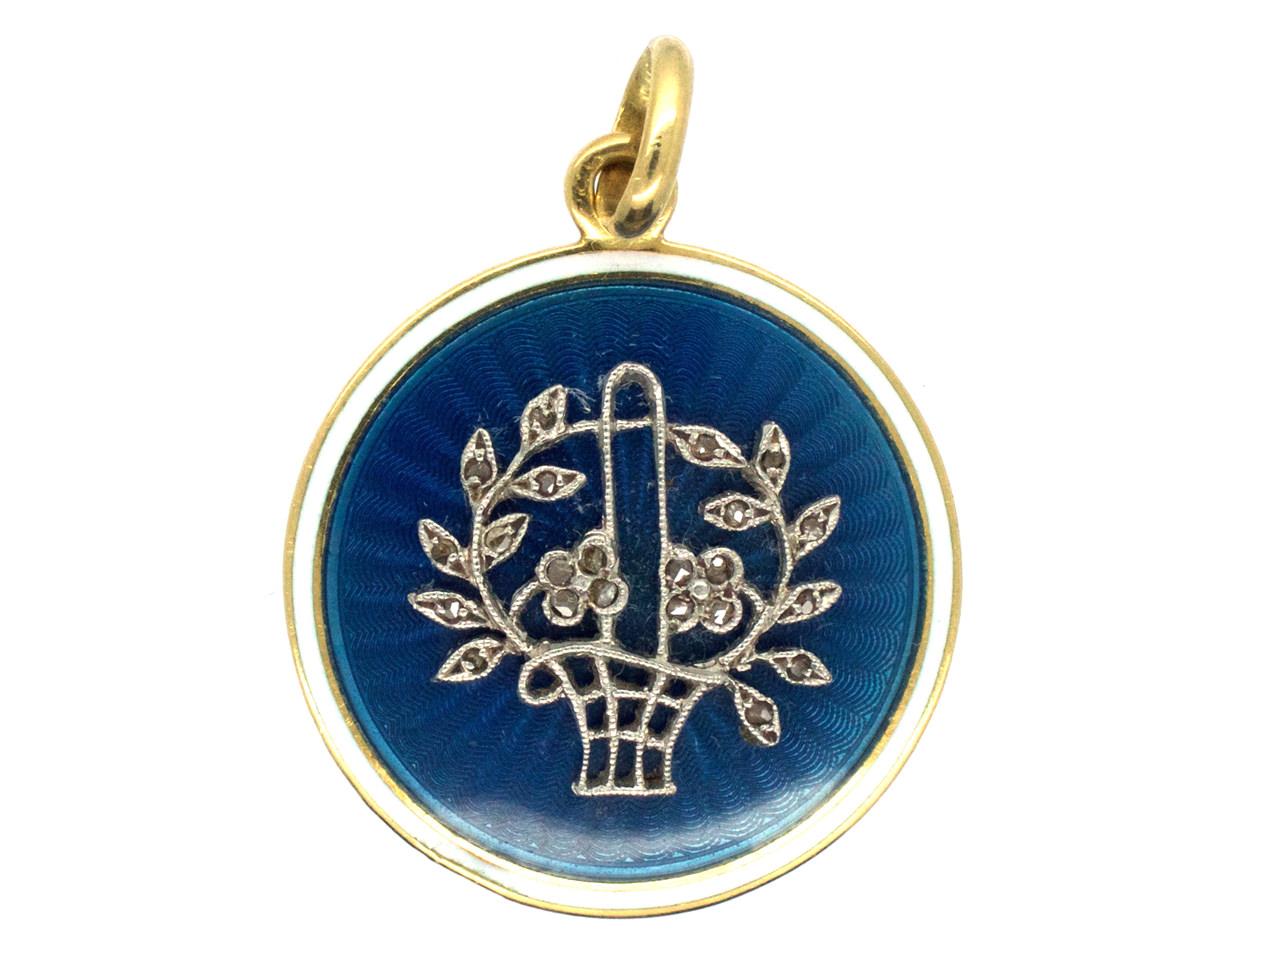 Edwardian Basket of Flowers 15ct Gold, Diamond & Enamel Round Pendant